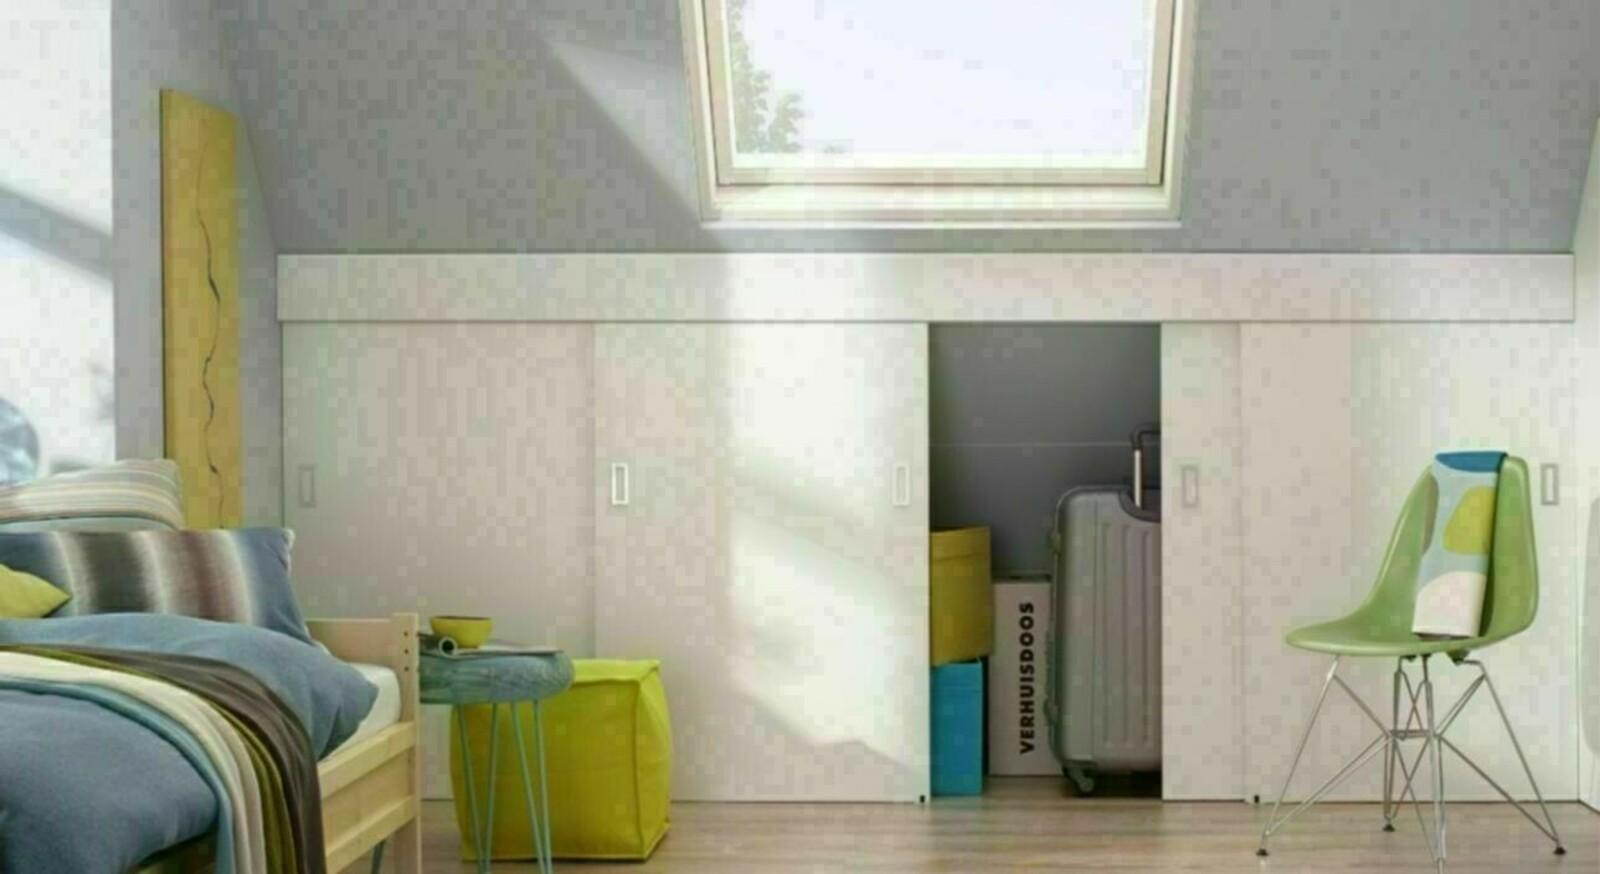 Keuken stelpoot optifit keukenonderkast ole breedte 60 cm in de online